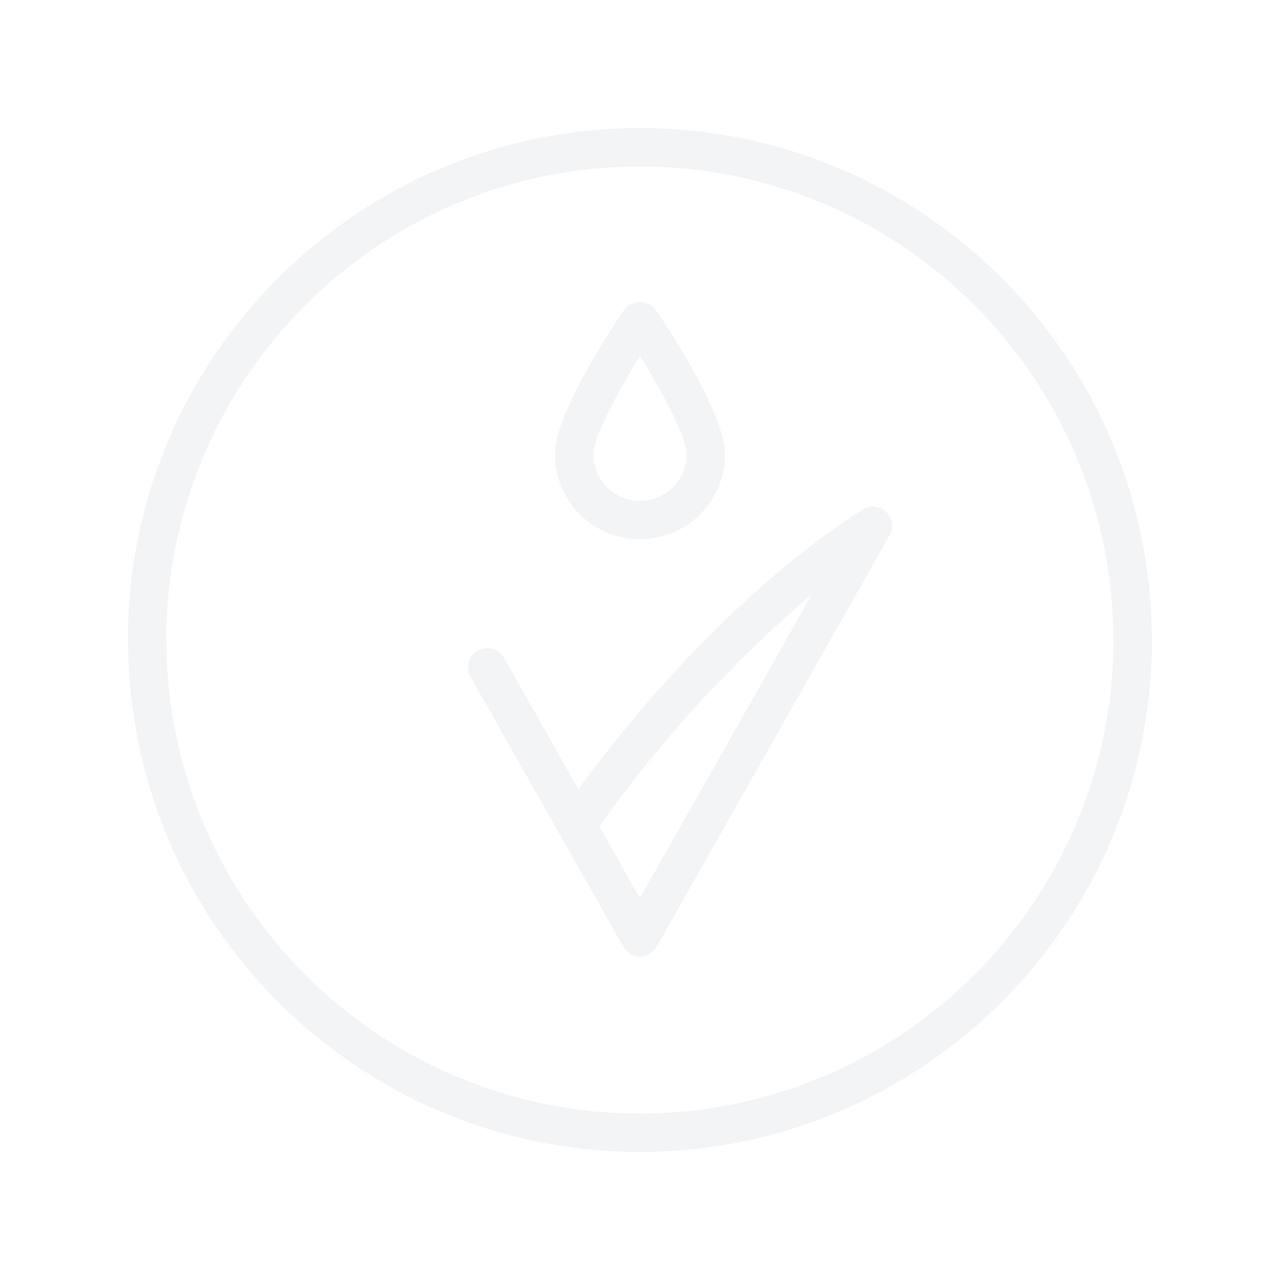 NARCISO RODRIGUEZ Narciso Poudree 50ml Eau De Parfum Gift Set подарочный набор